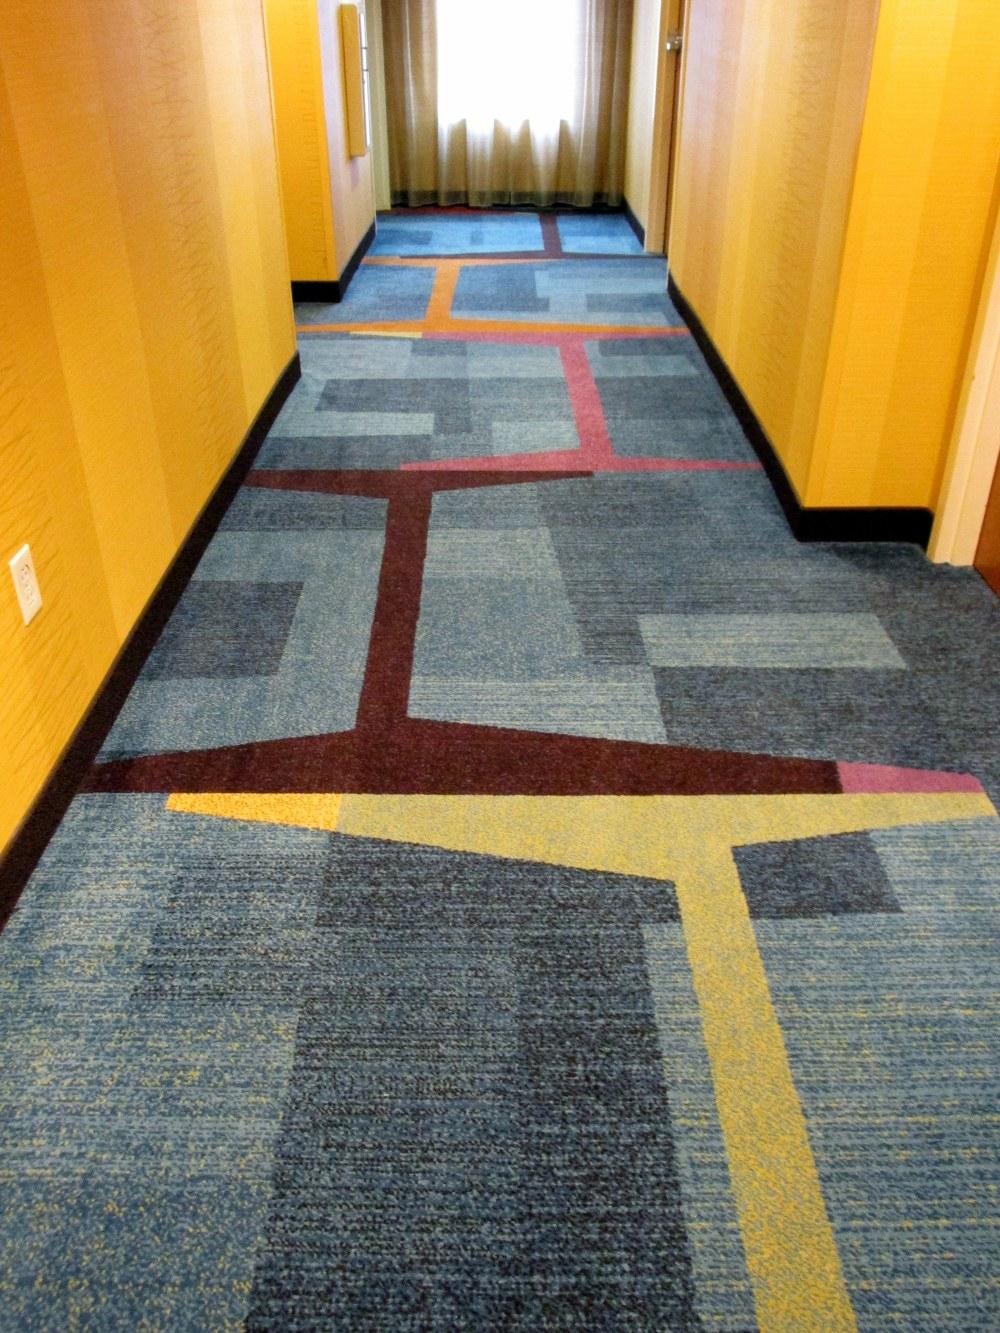 corridorcarpetdesignbFairfieldInnhotelKennettSquarePA12Oct2017